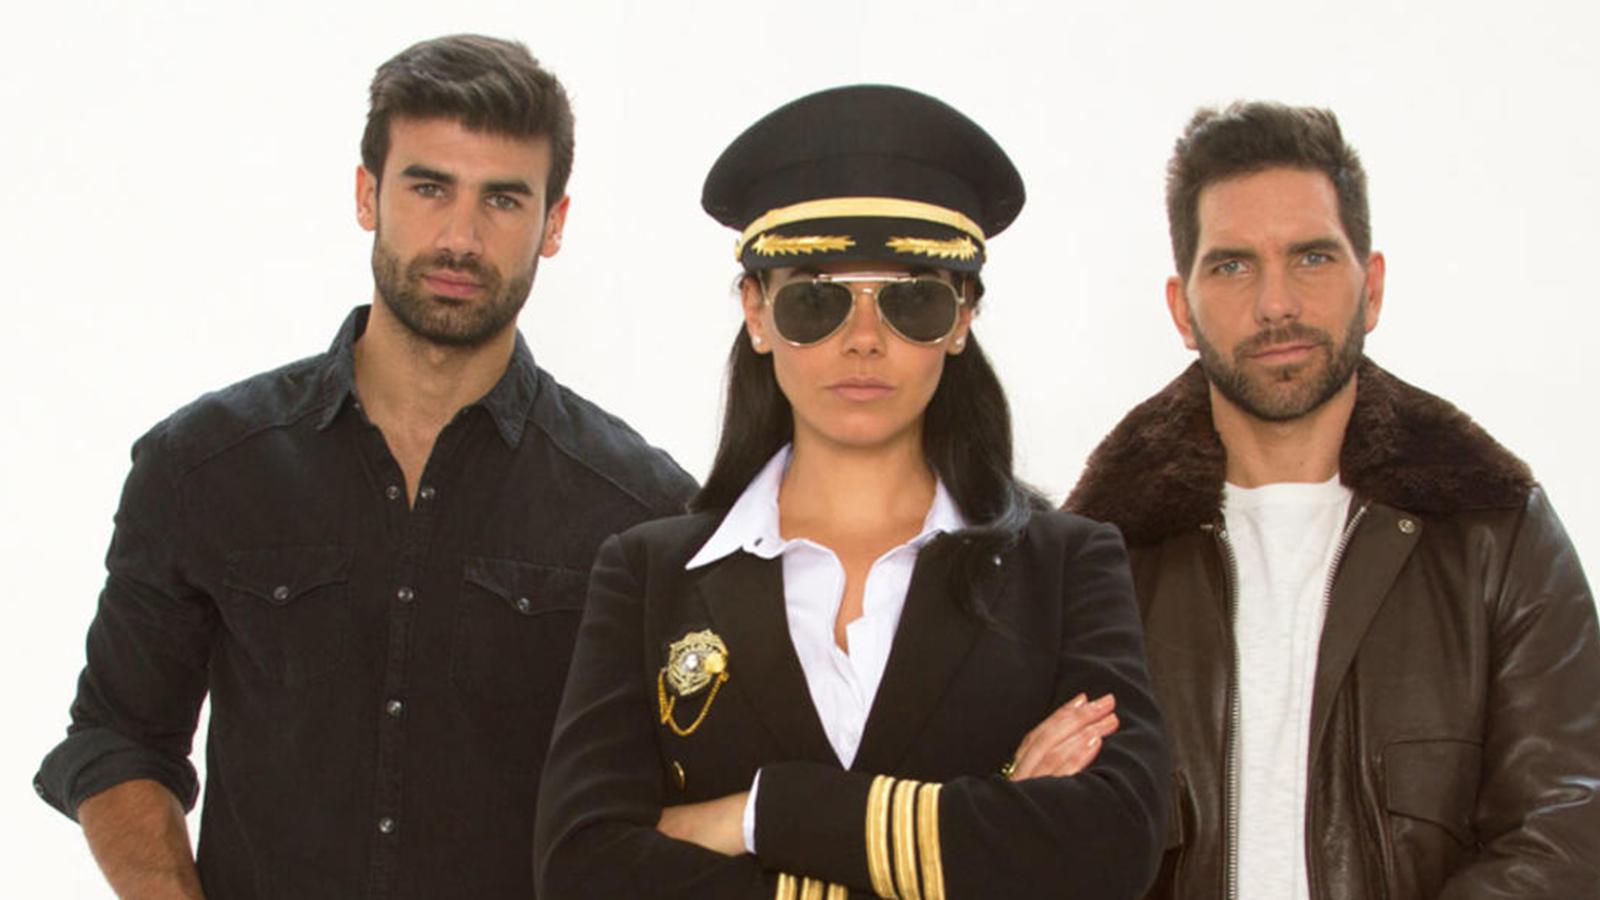 7 de marzo gran estreno de la piloto por univision cr tica novela tv - Piloto photo studio ...